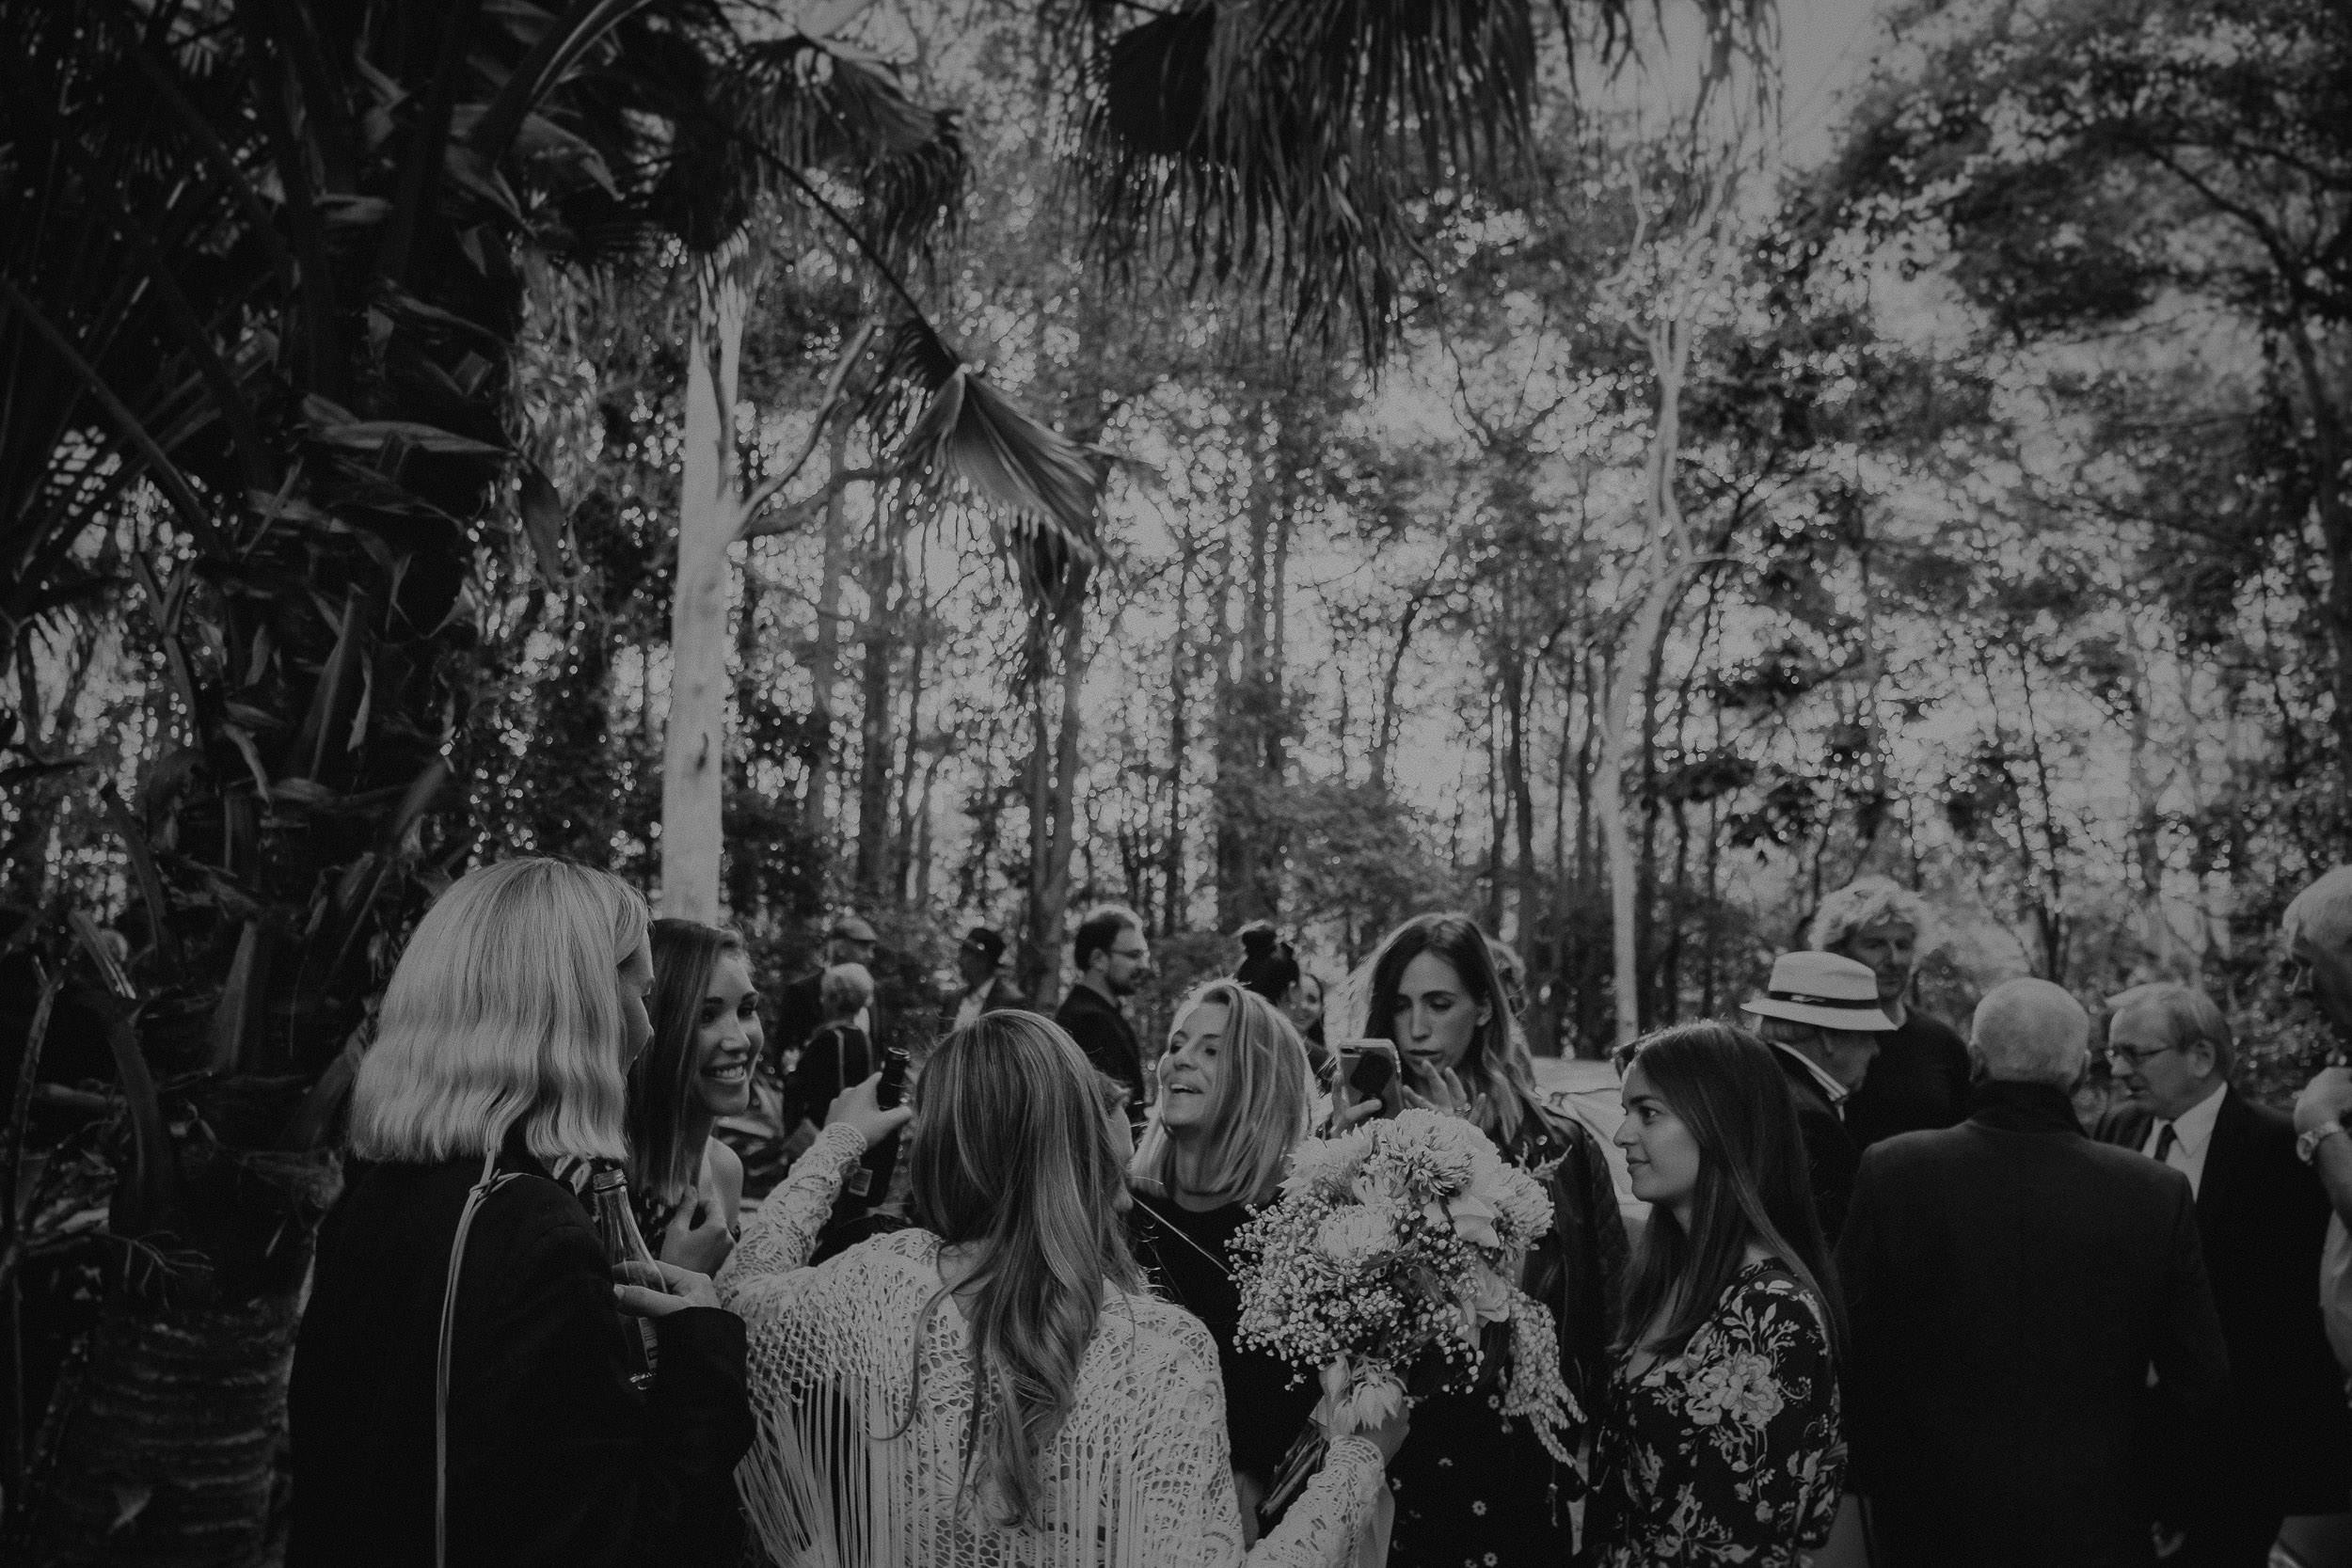 S&A Elopement - Kings & Thieves - Shred 'Til Dead - Central Coast Beach Forest Wedding - 342.jpg